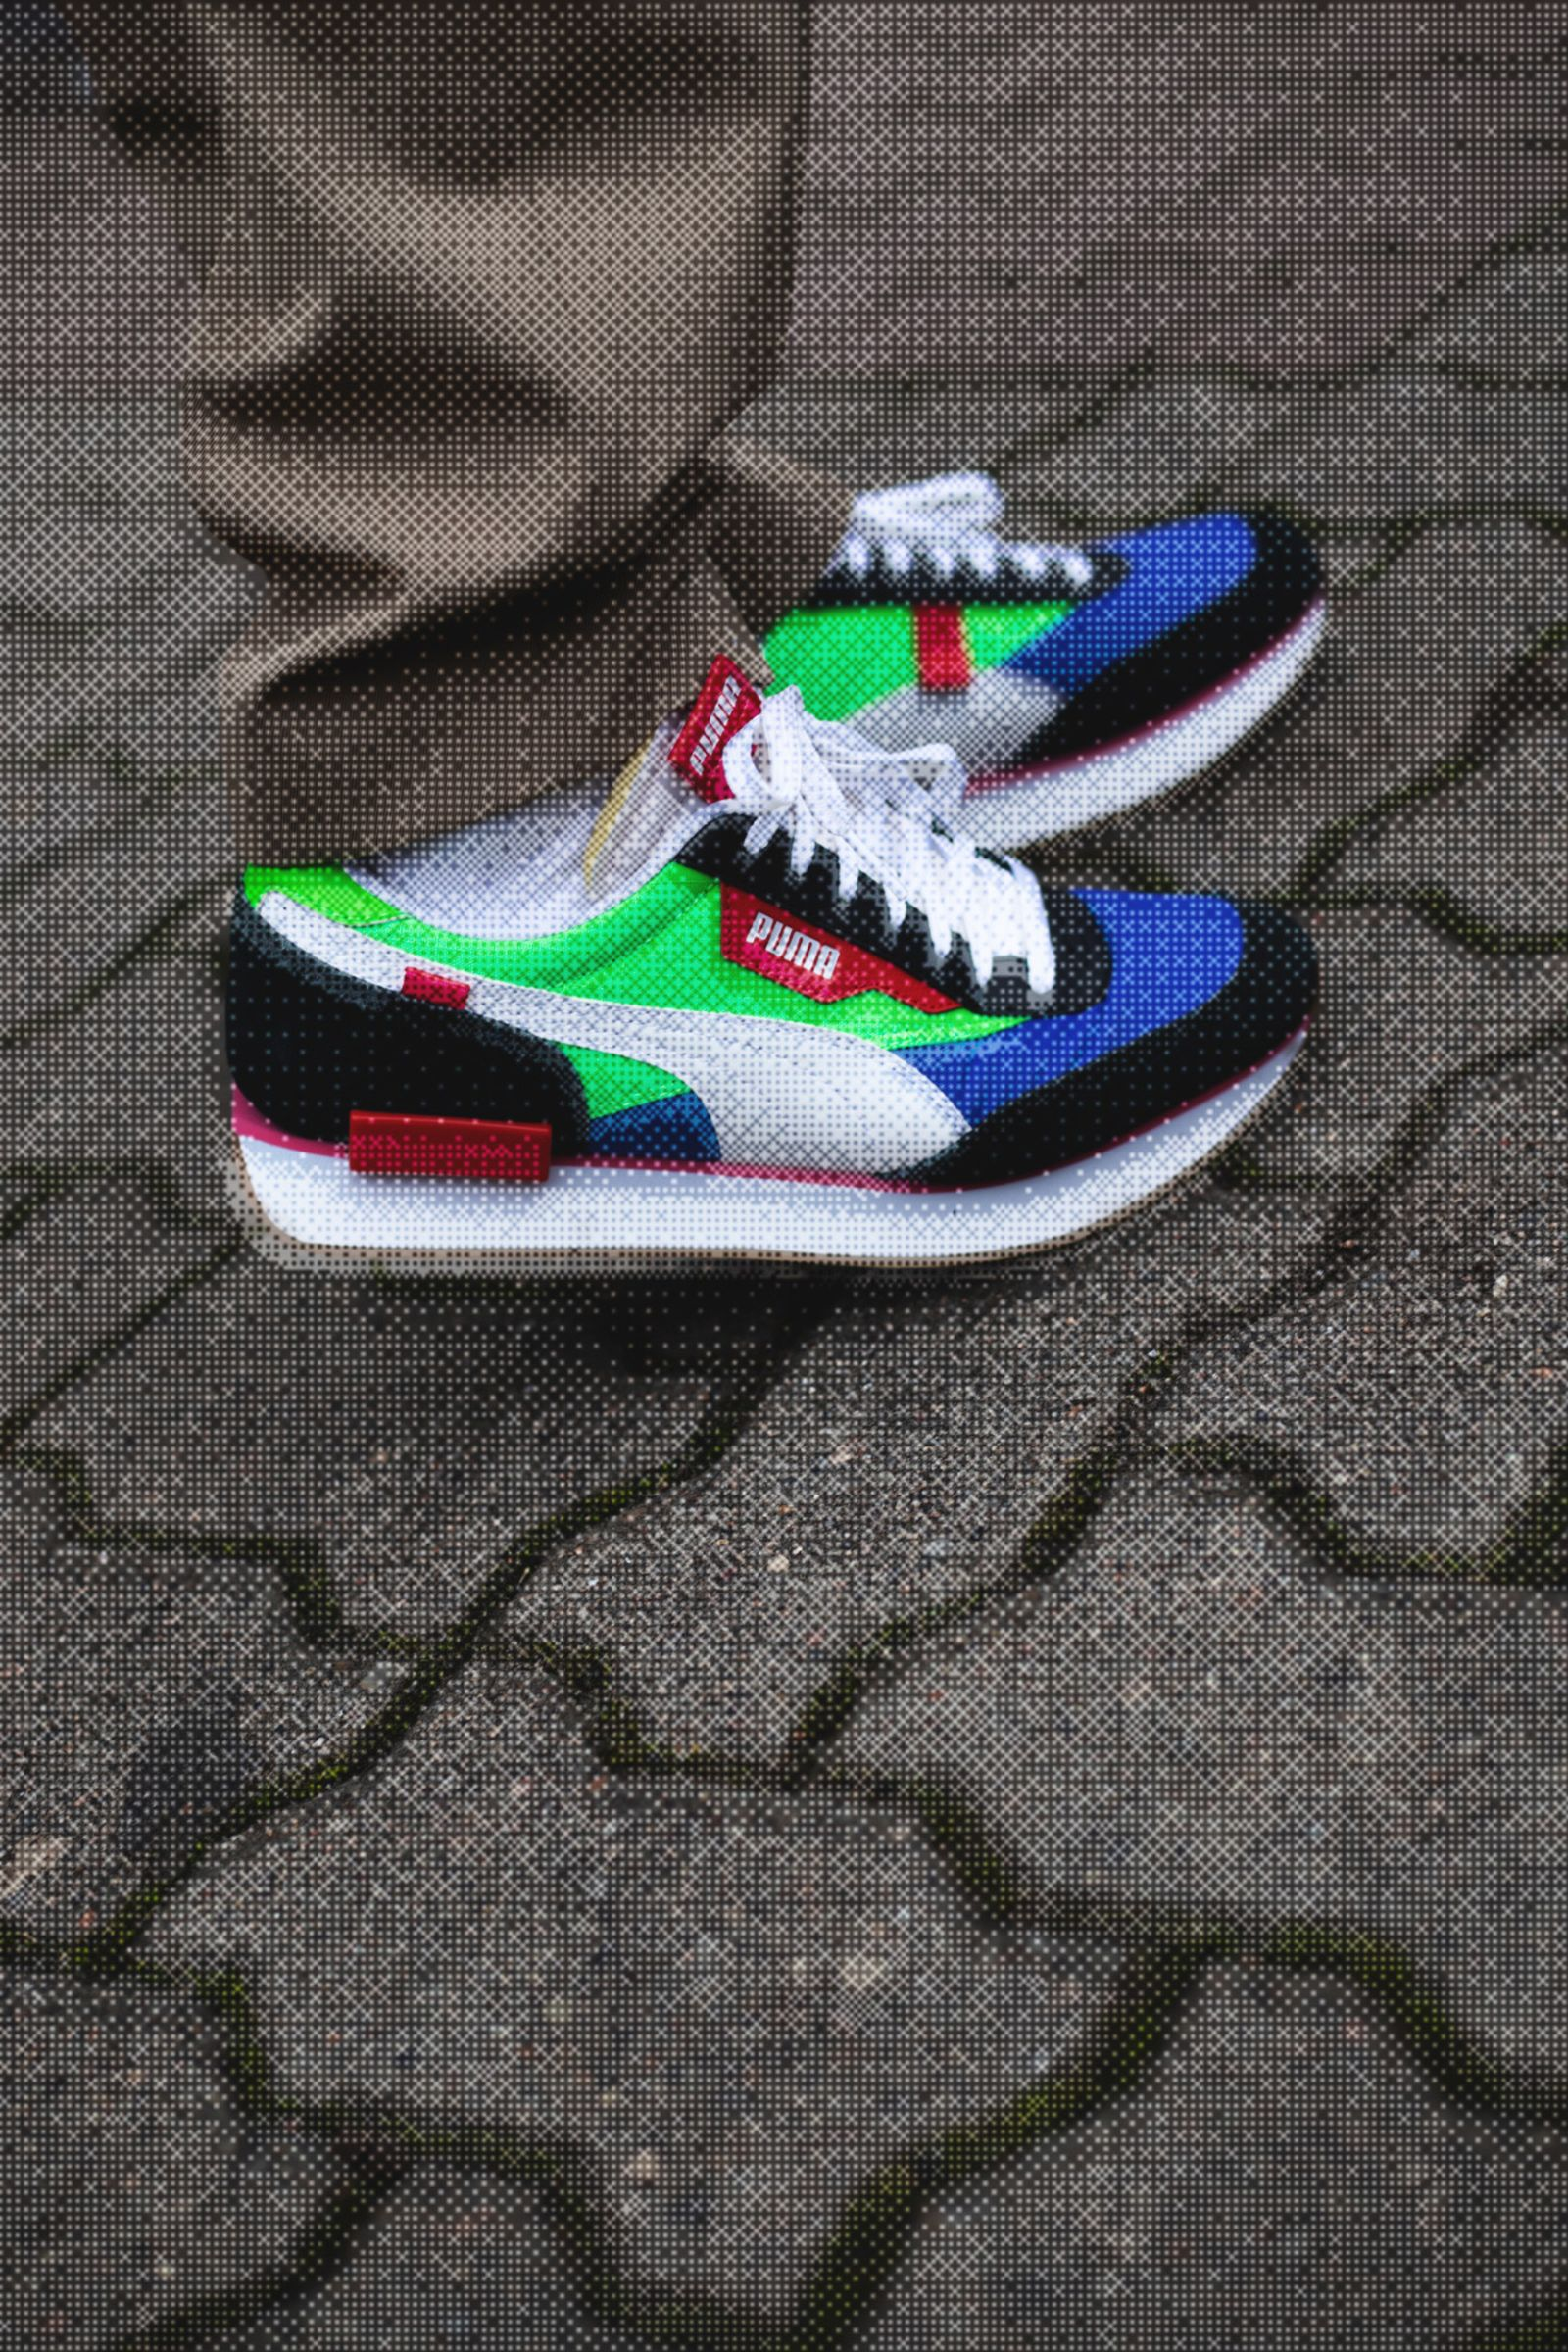 puma-future-rider-sneaker-release-date-price-03